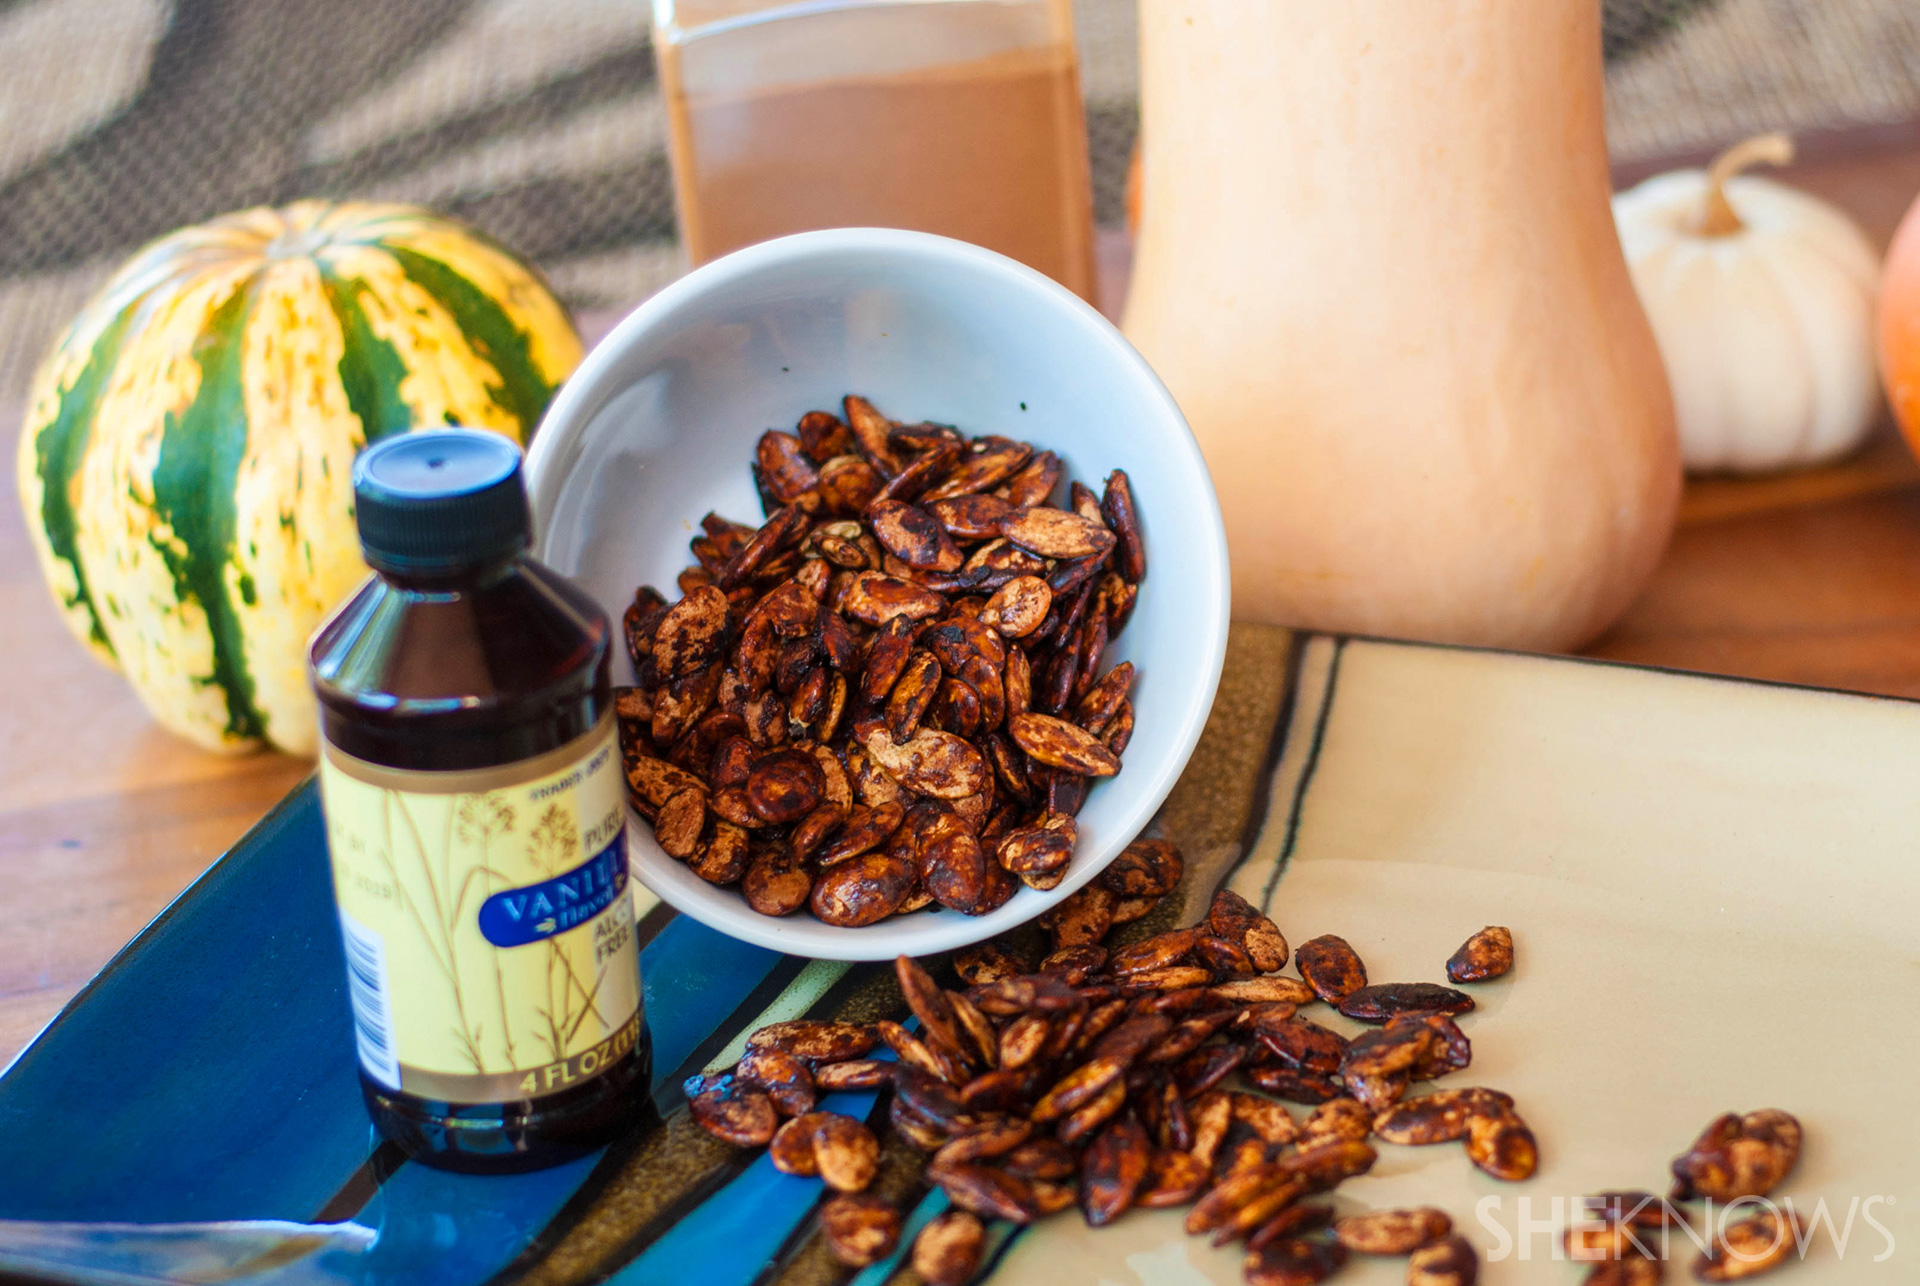 Cinnamon vanilla brown sugar roasted squash seeds recipe